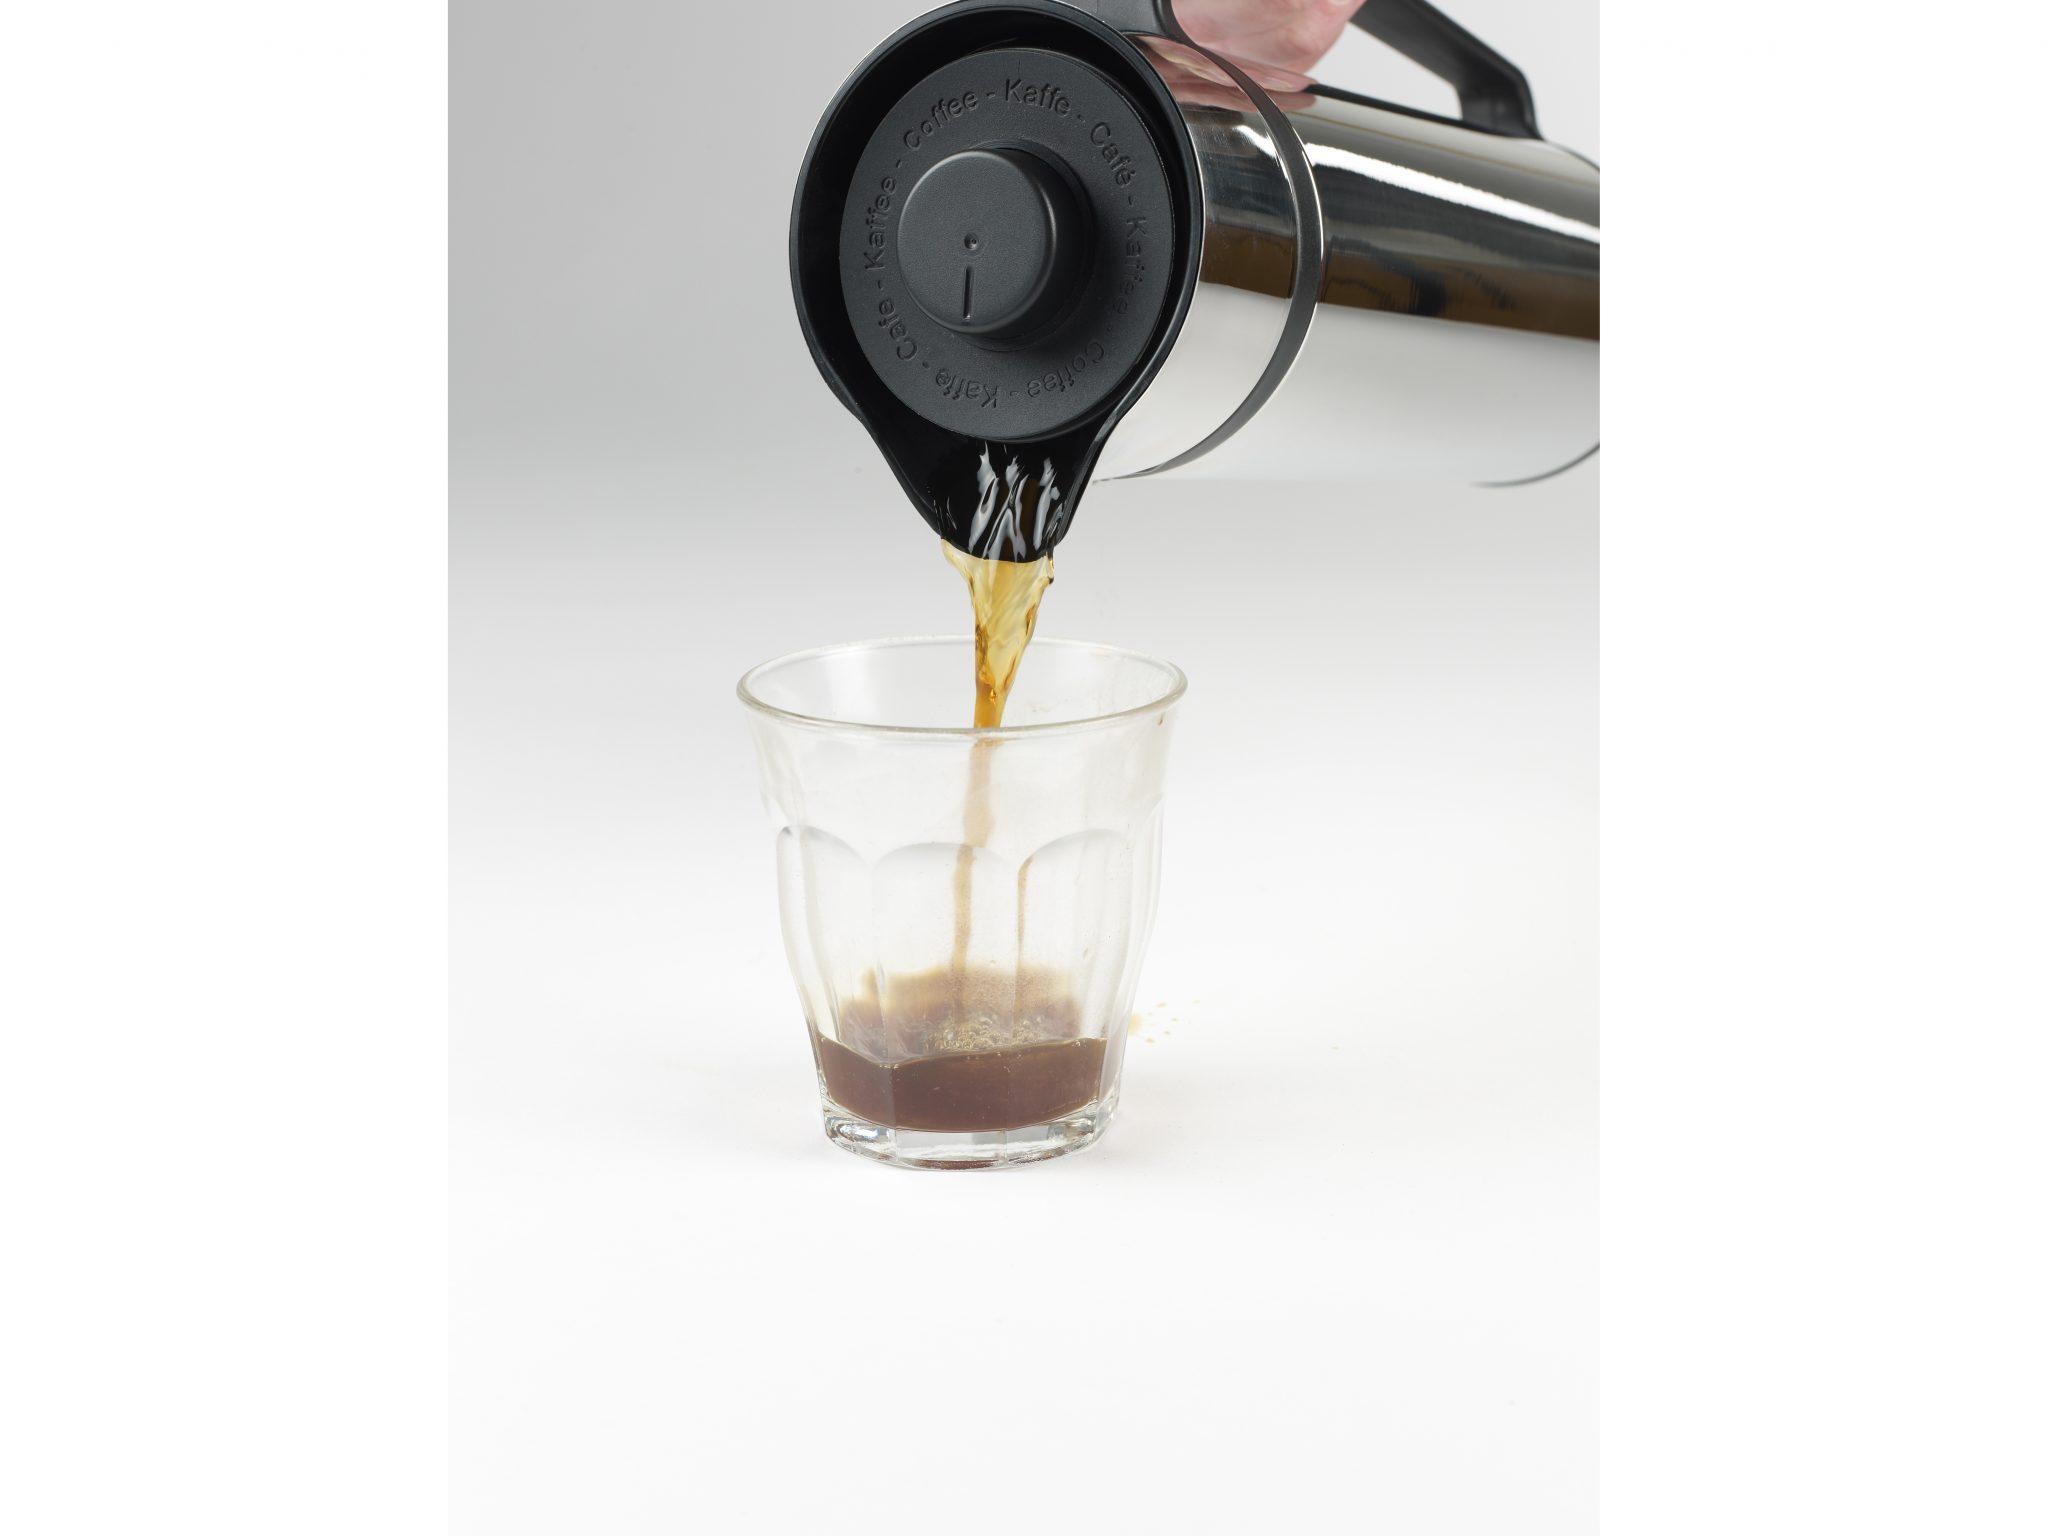 丹麥 nuance 咖啡壺